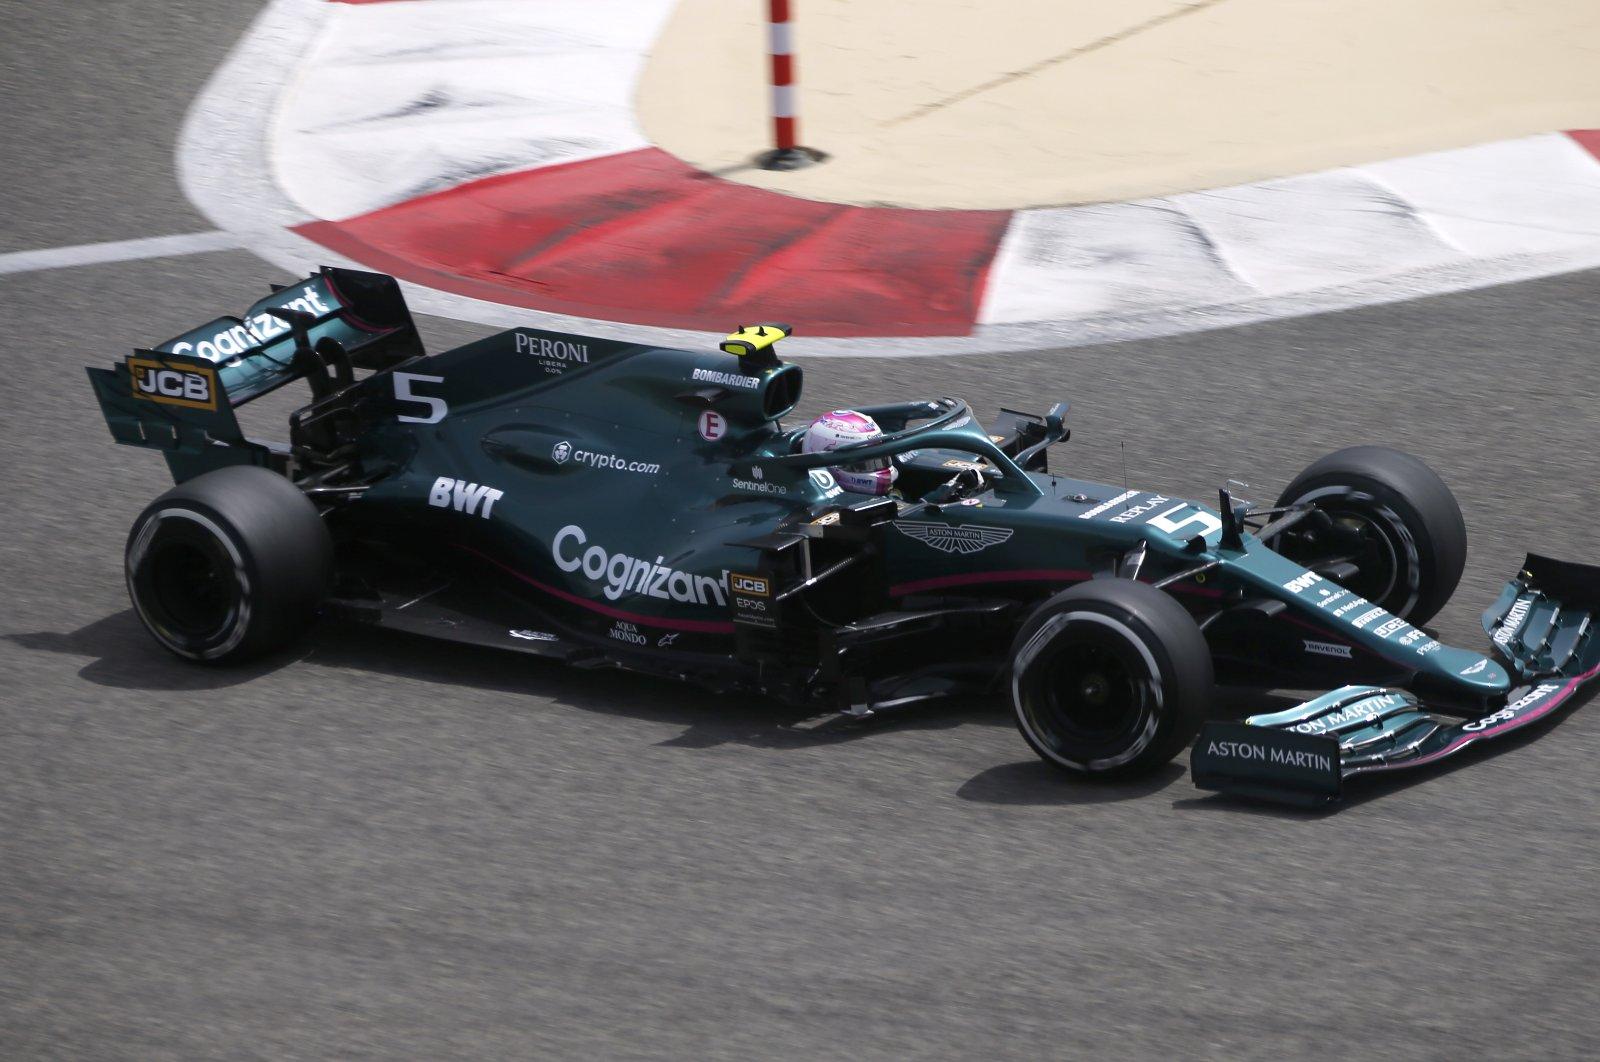 Aston Martin's Sebastian Vettel in action during pre-season testing at the Bahrain International Circuit, in Sakhir, Bahrain, March 12, 2021. (Reuters Photo)